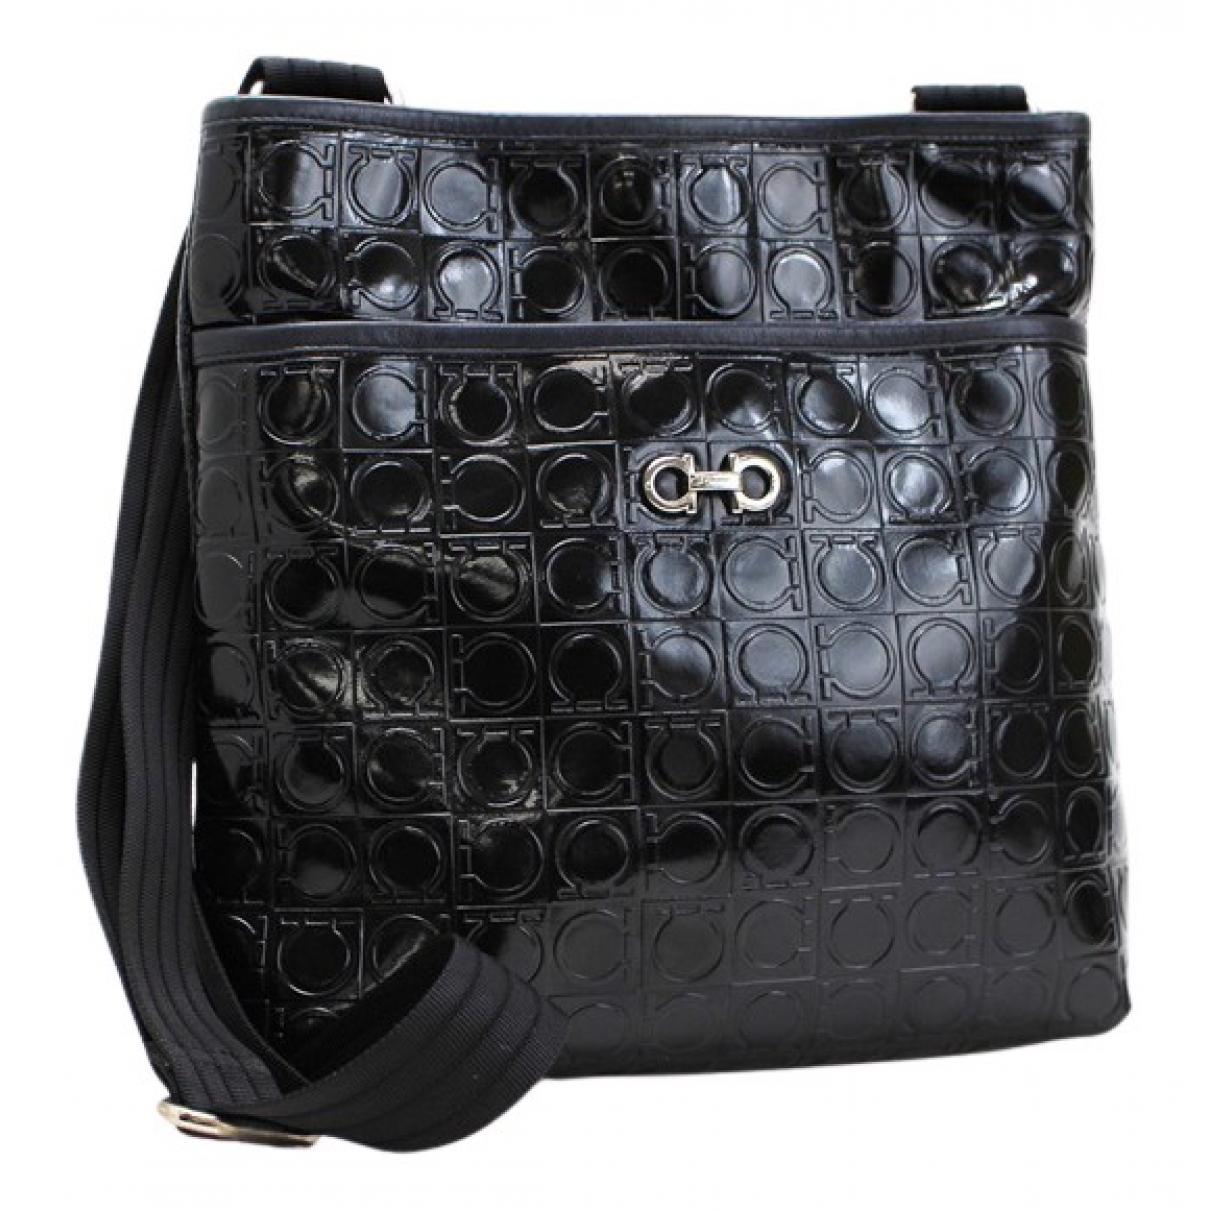 Salvatore Ferragamo N Black Patent leather handbag for Women N